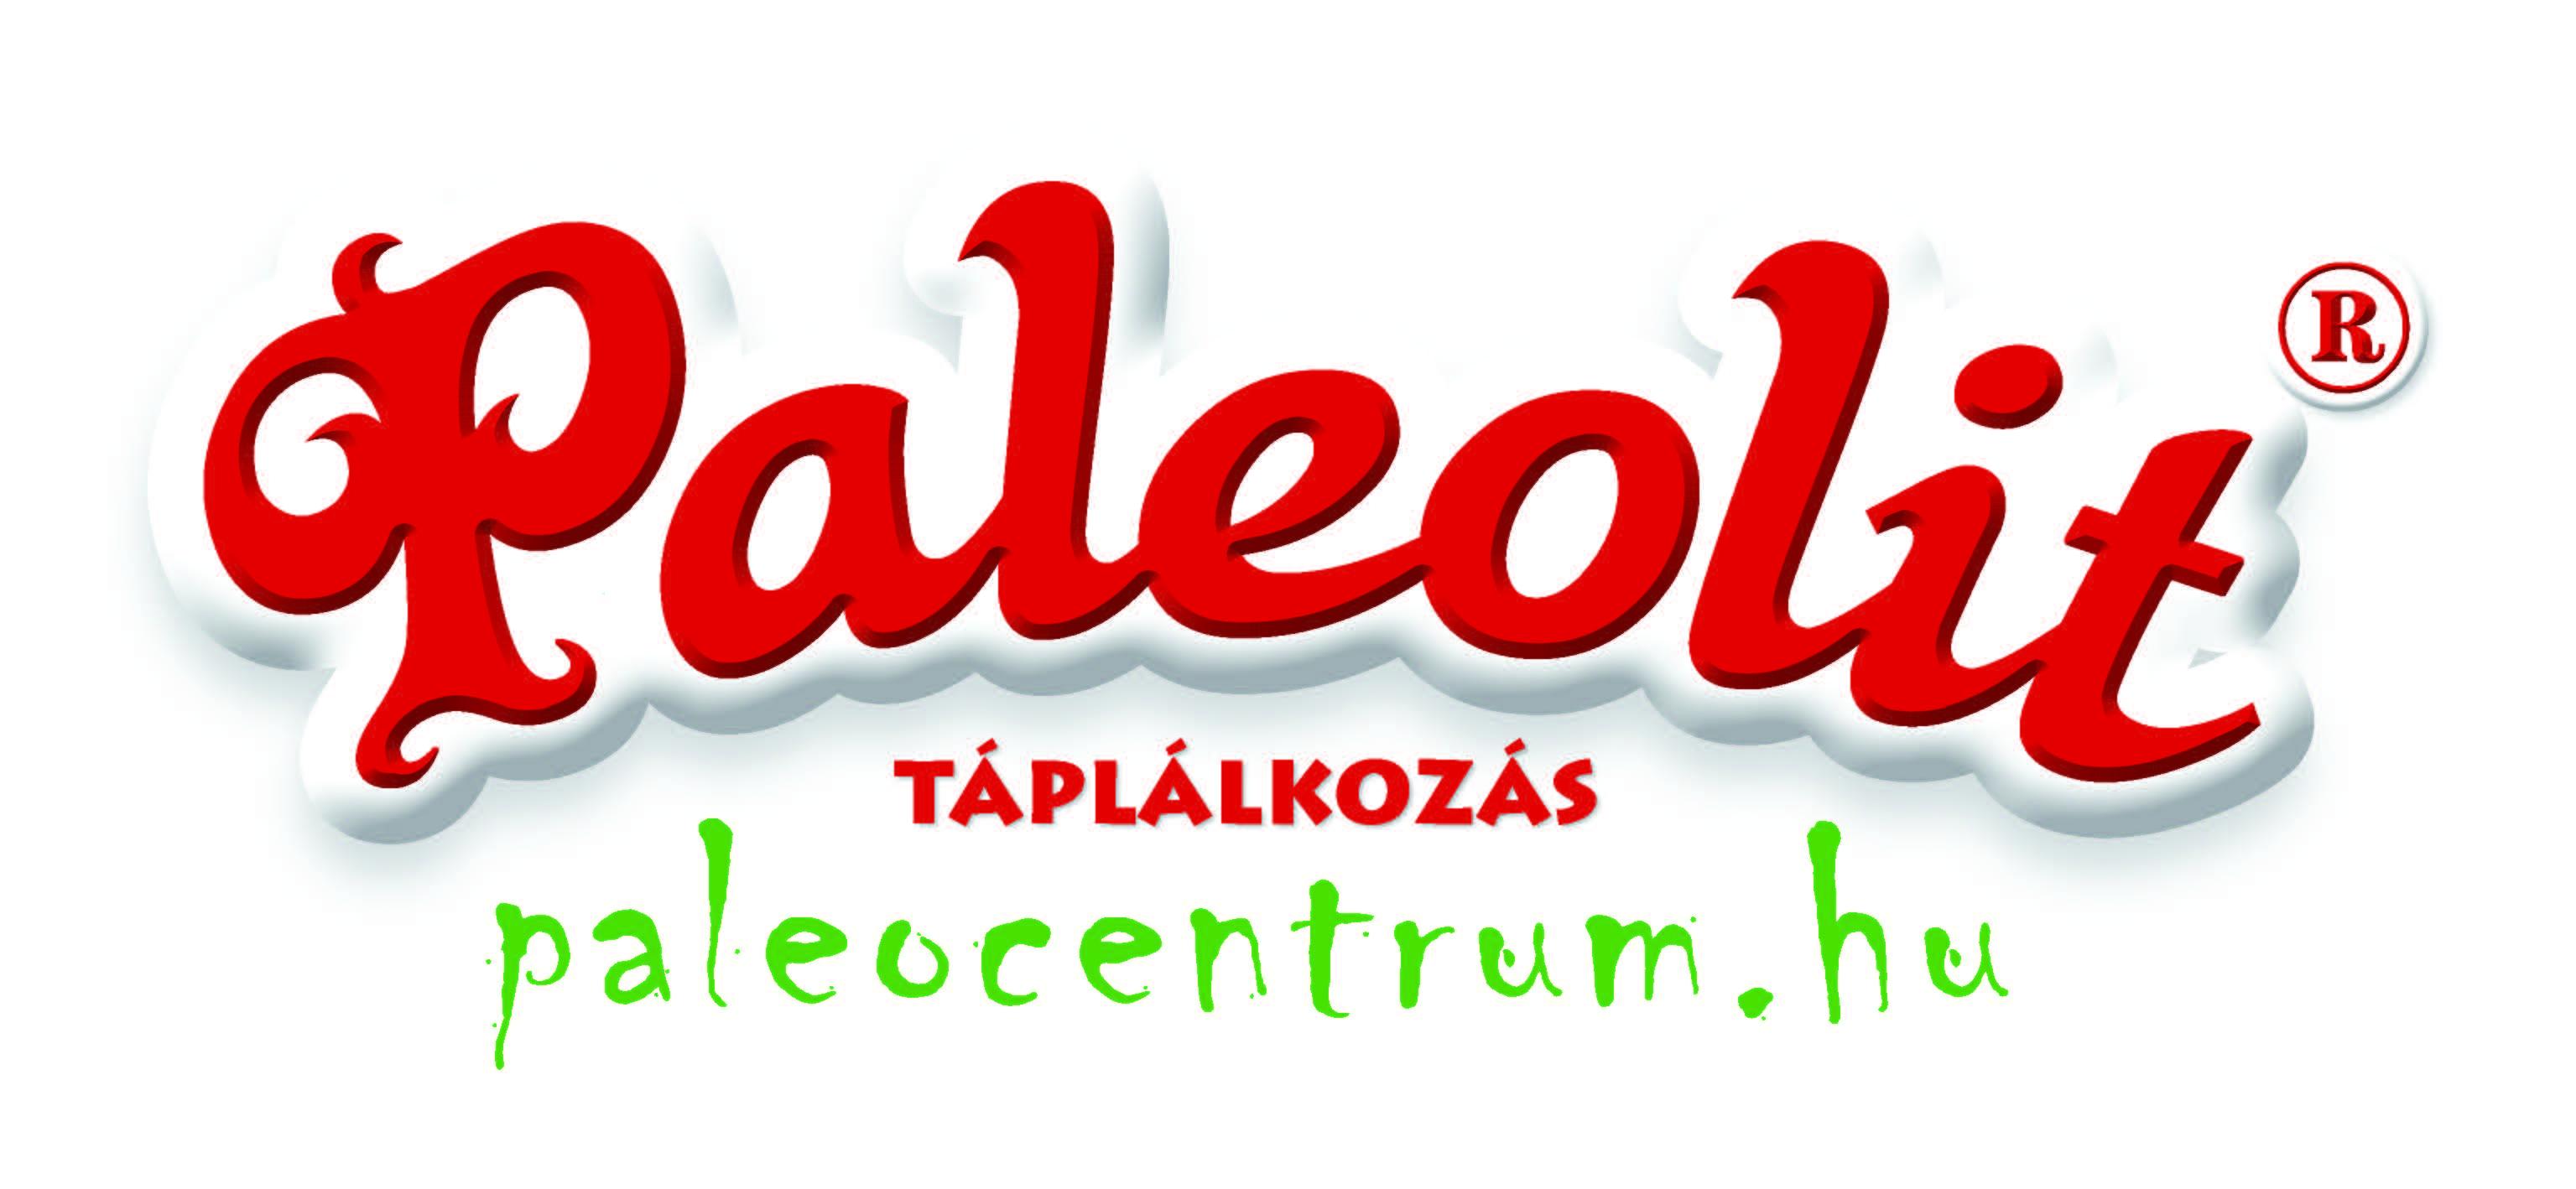 Paleocentrum Kft